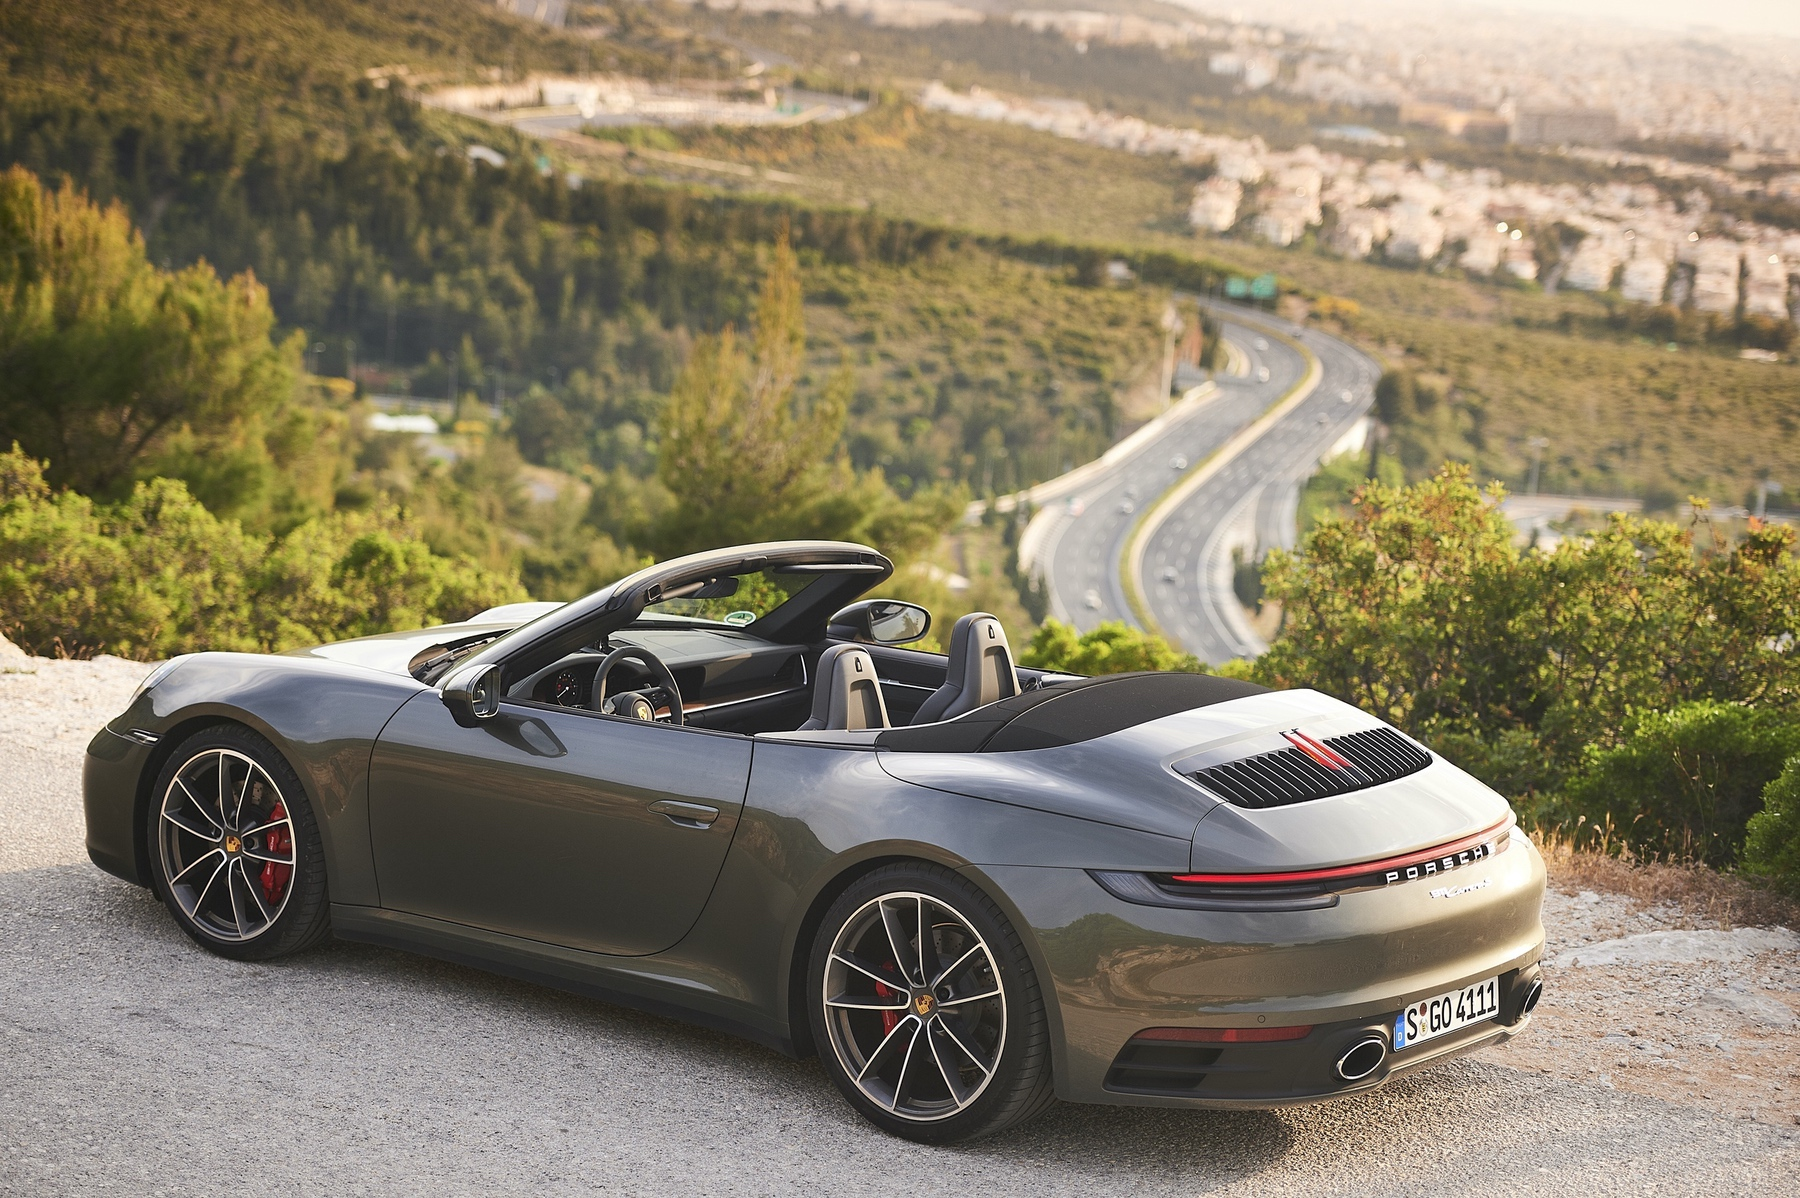 Test_Drive_Porsche_911_Athens_0049